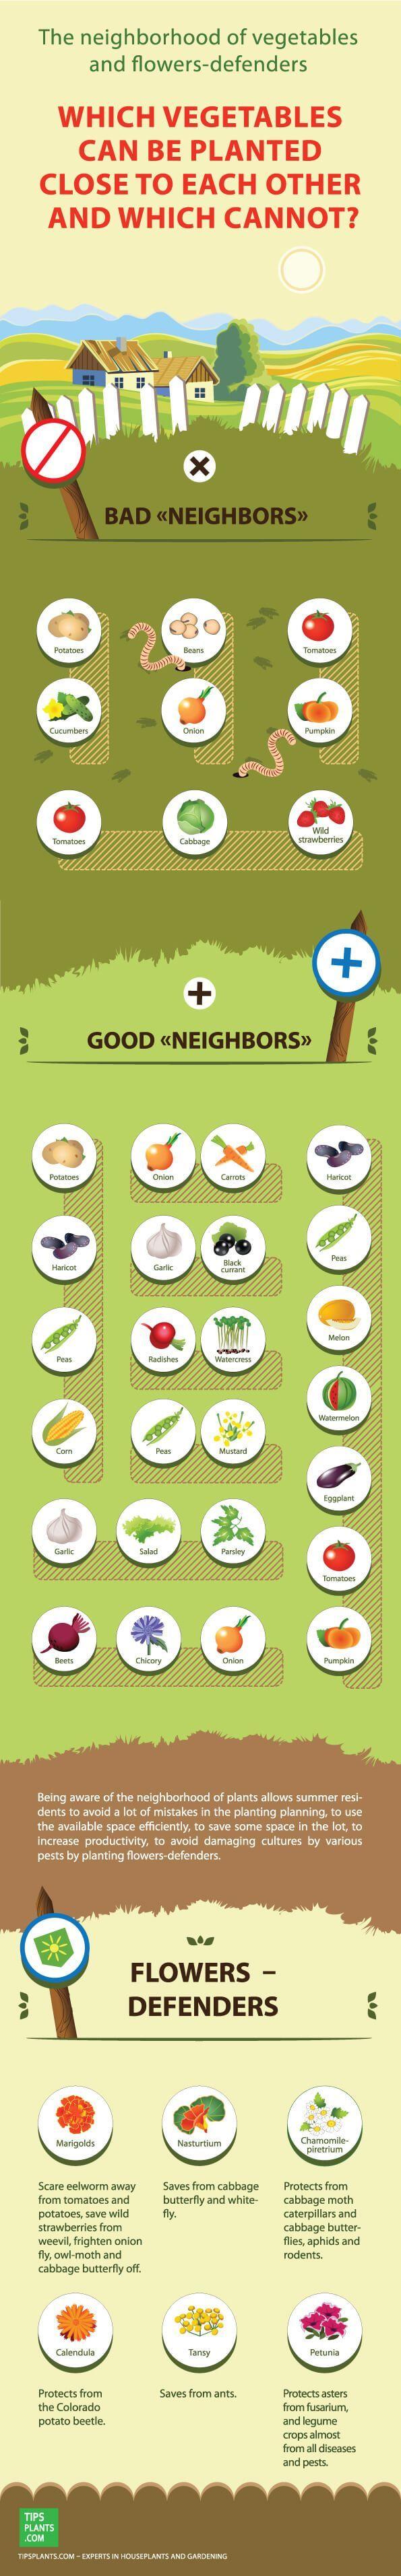 http://test.de for more infos about cooking(Diy Garden Bed)